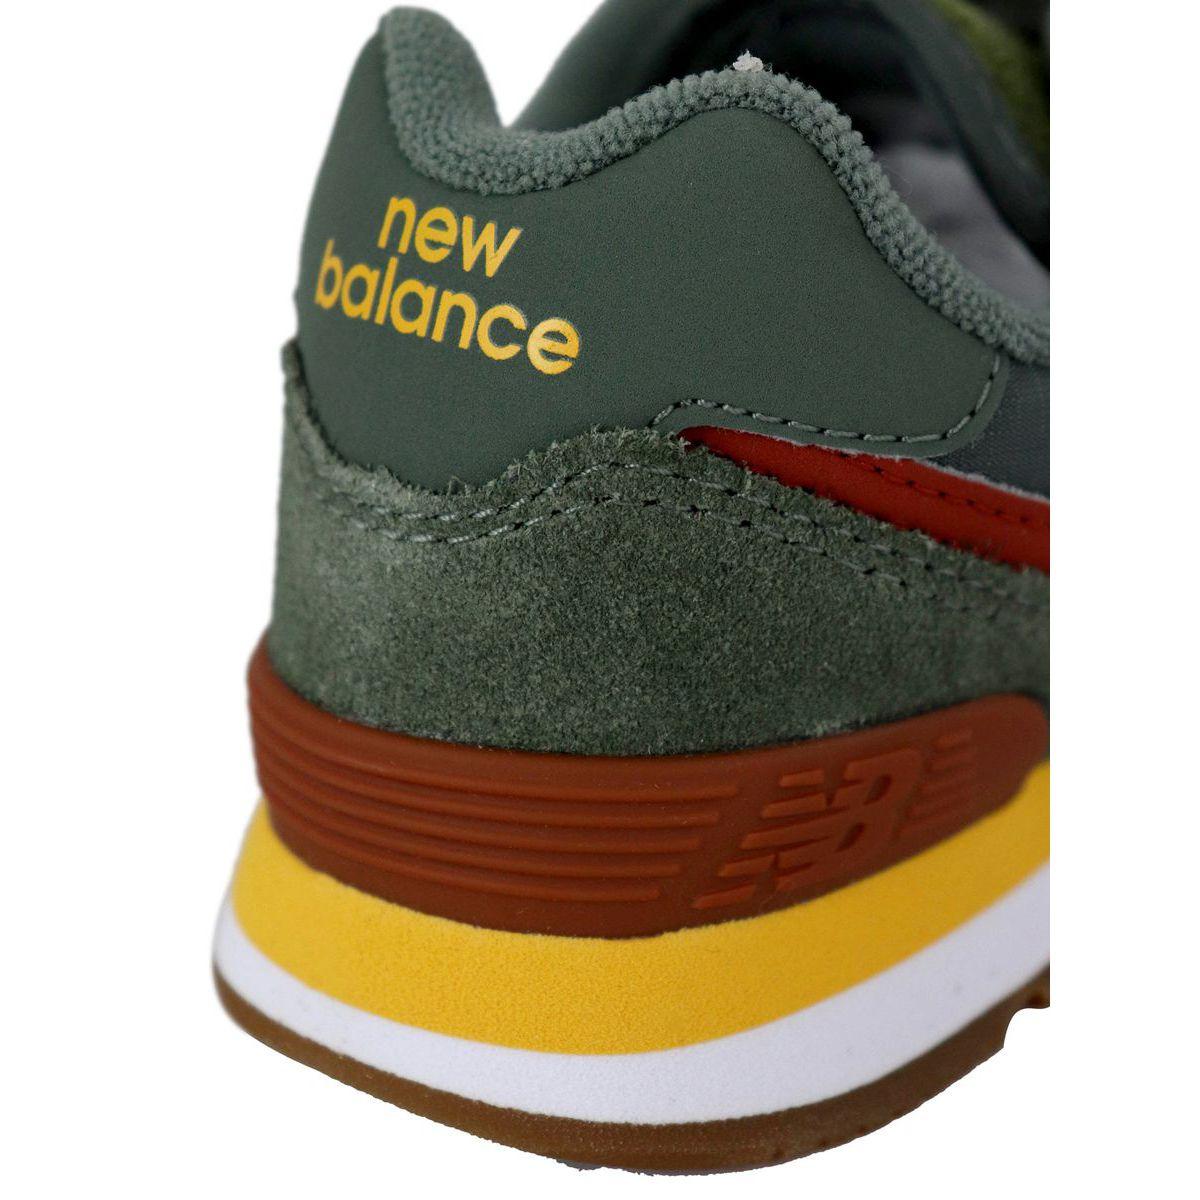 new balance neonato gialle